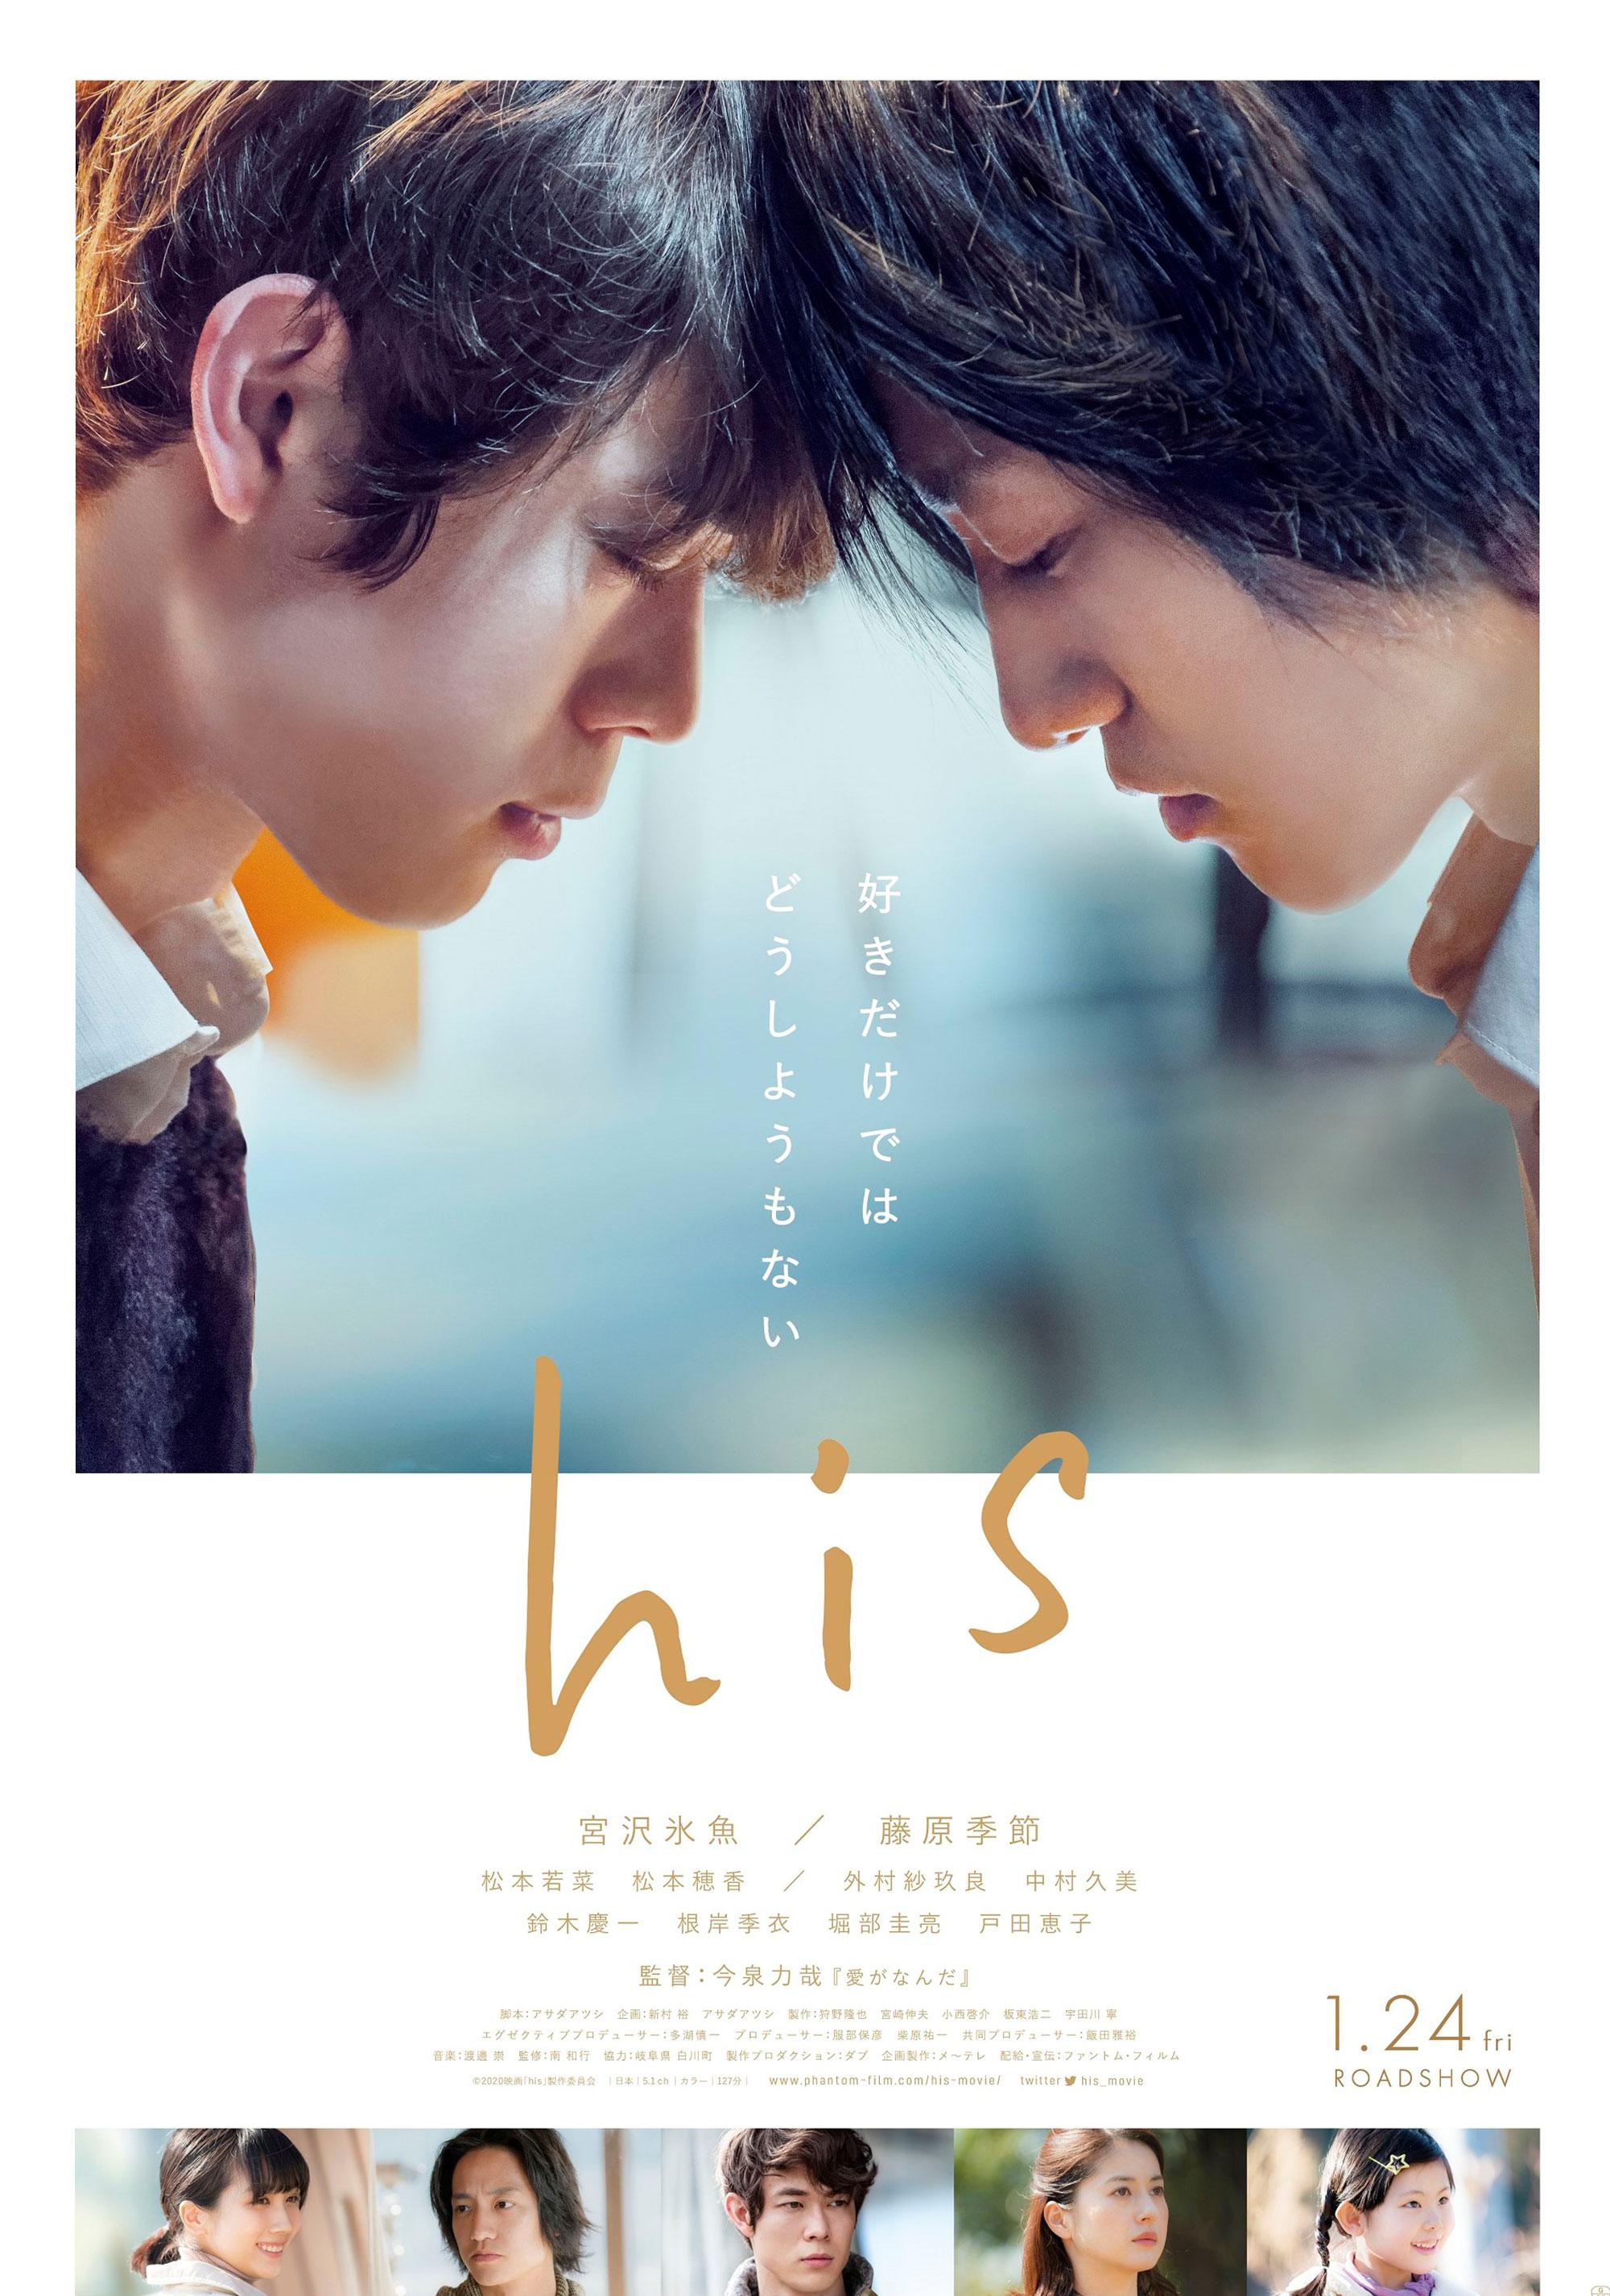 ©2020 映画「his」製作委員会